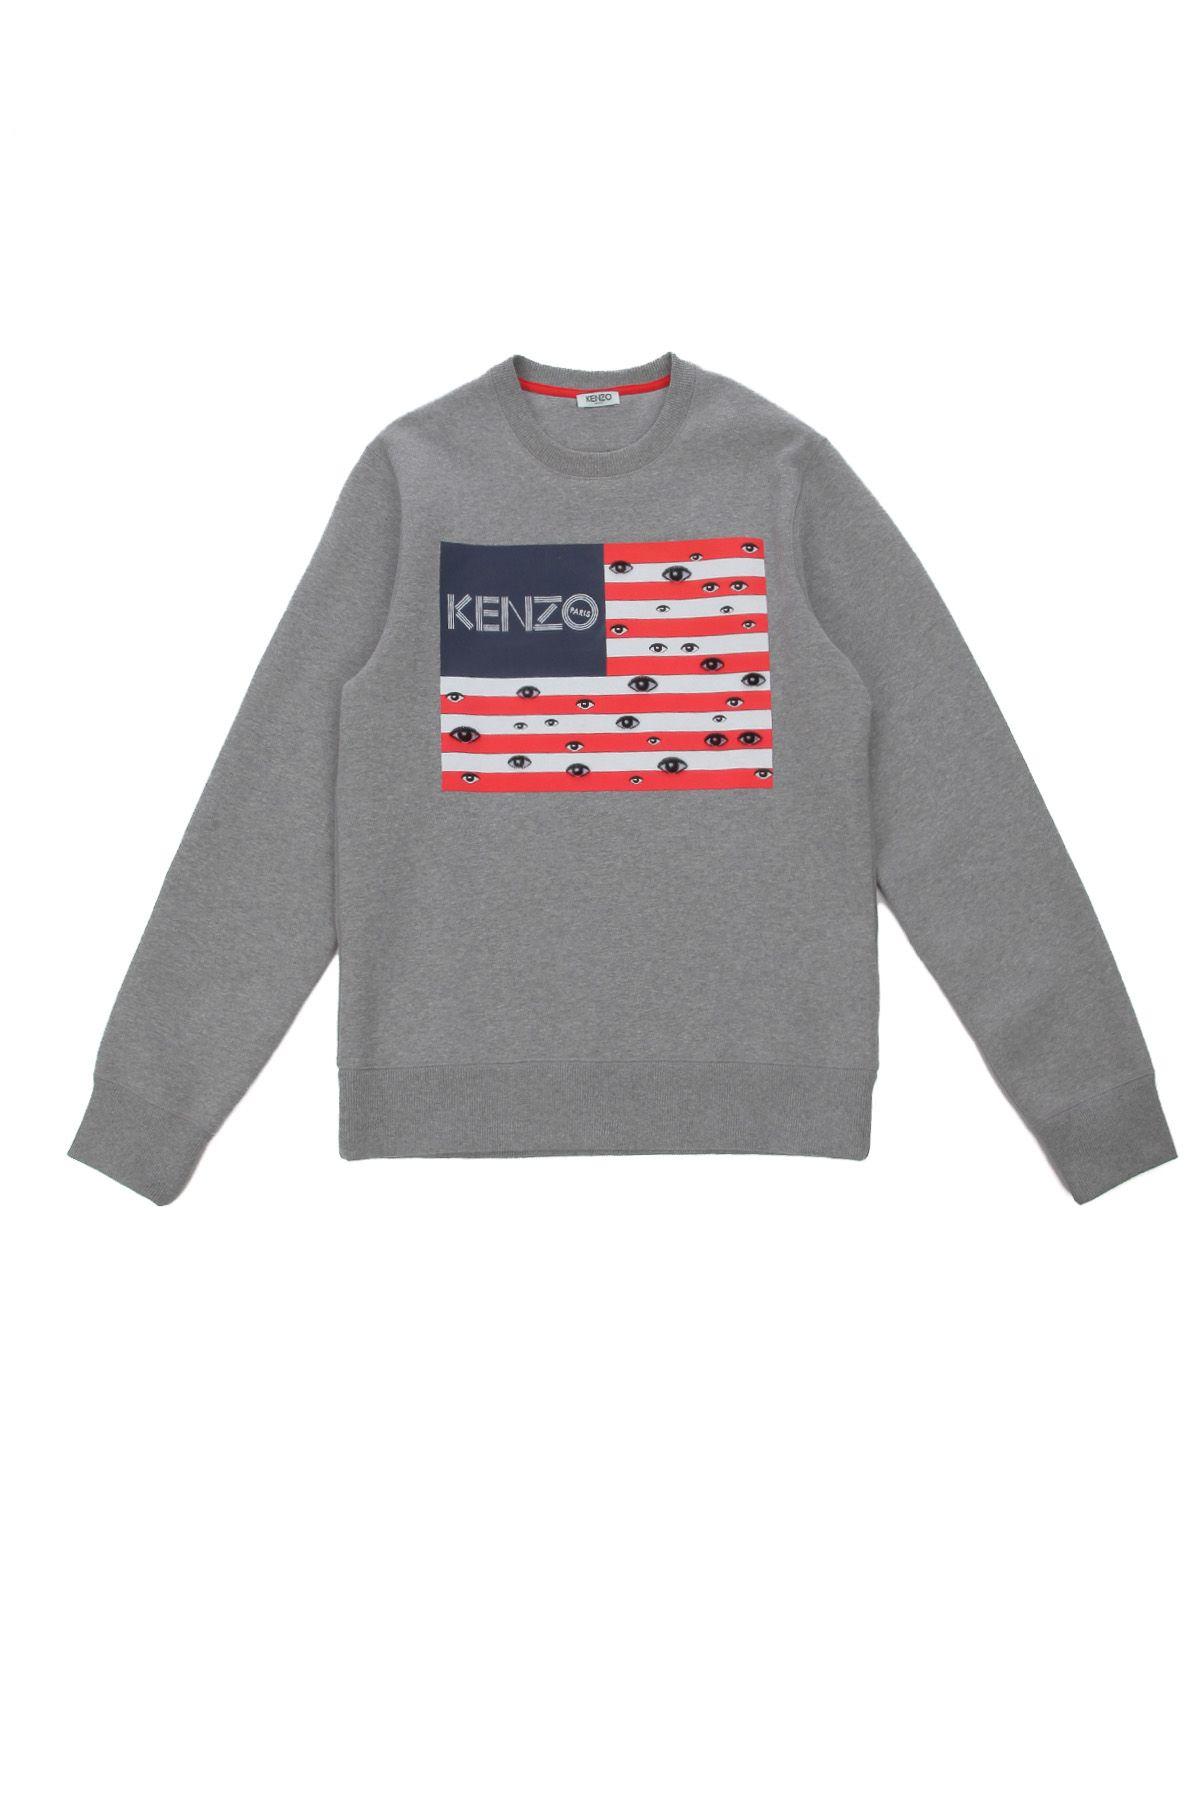 Kenzo x Toilet Paper Eye Flag Sweatshirt | red, white & blue